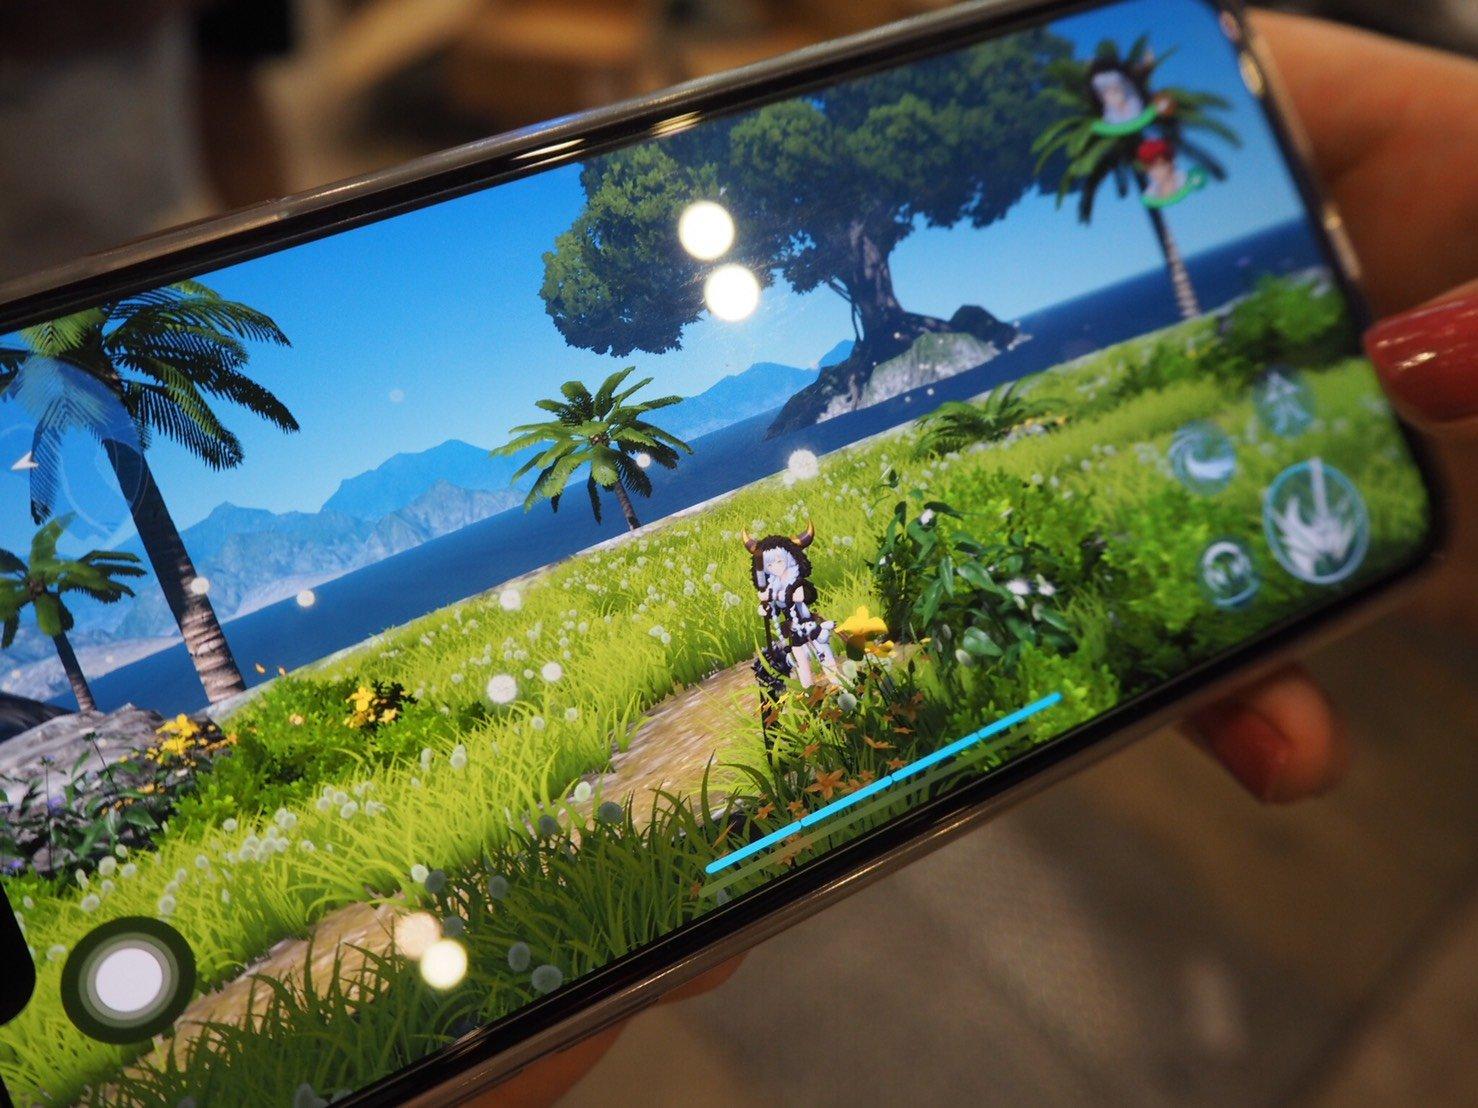 TGS 2019 | اولین تصاویر از گیمپلی بازی YS VIII Mobile منتشر شد